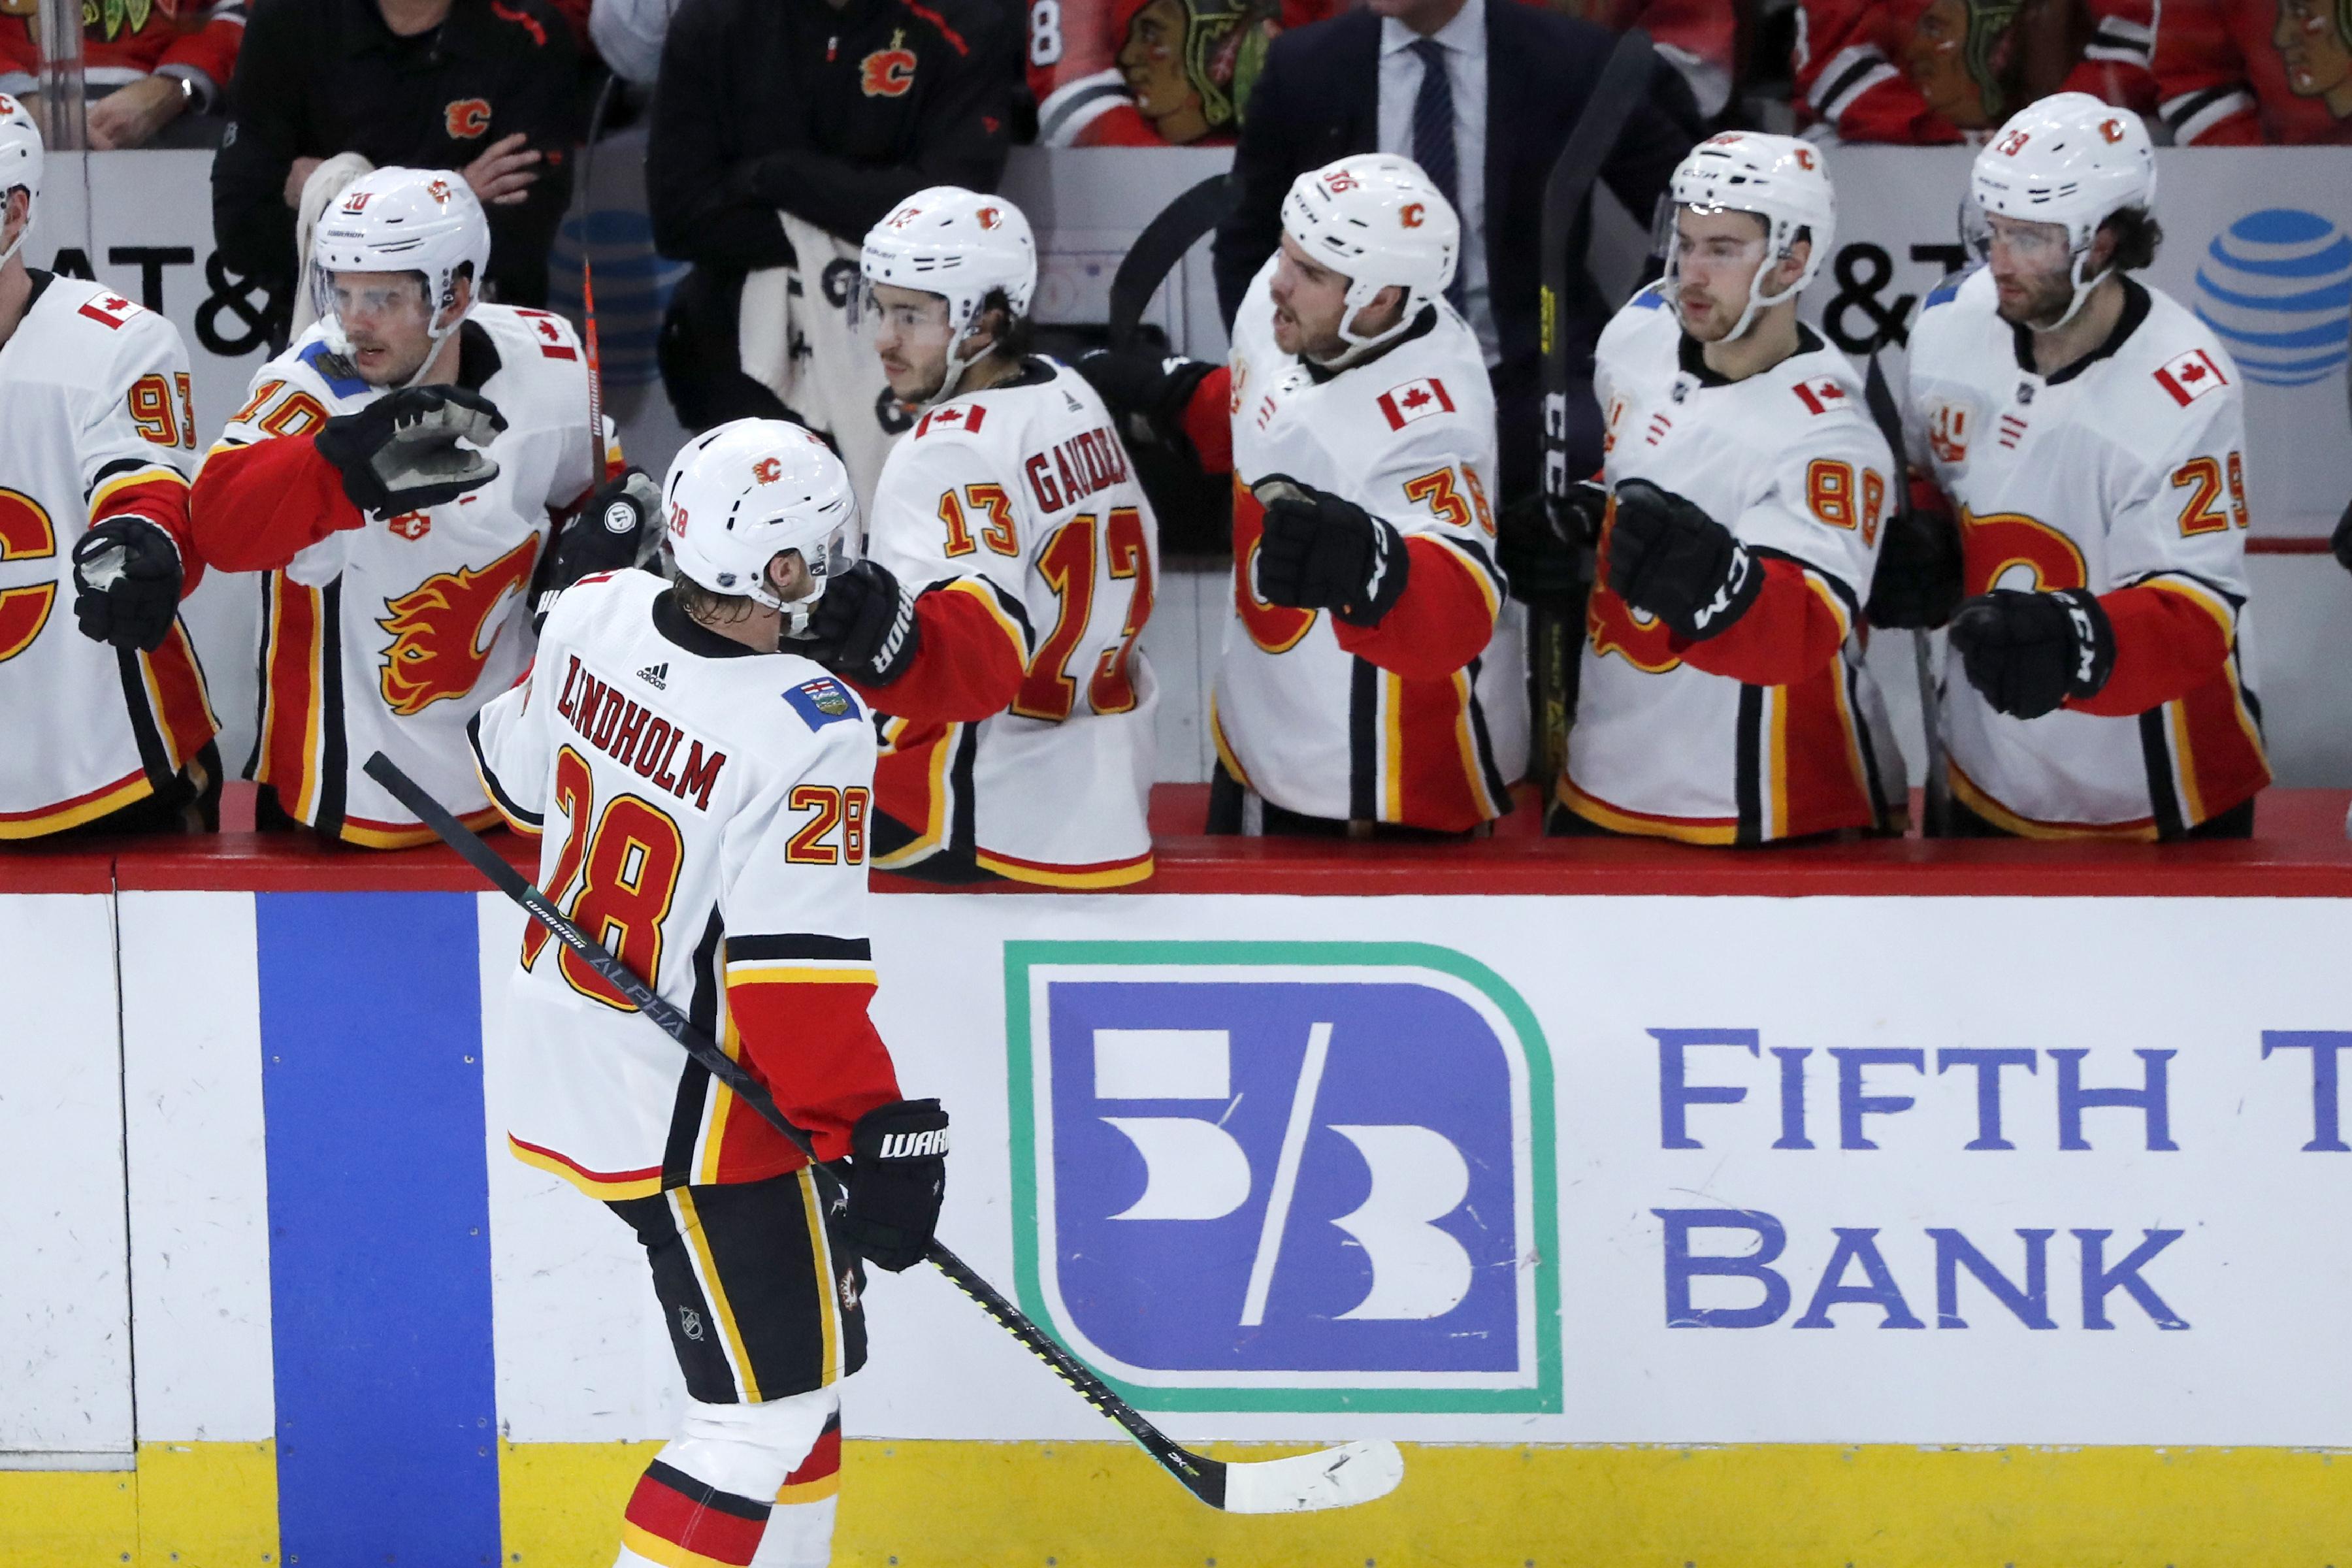 Lindholm leads Flames past Blackhawks 2-1